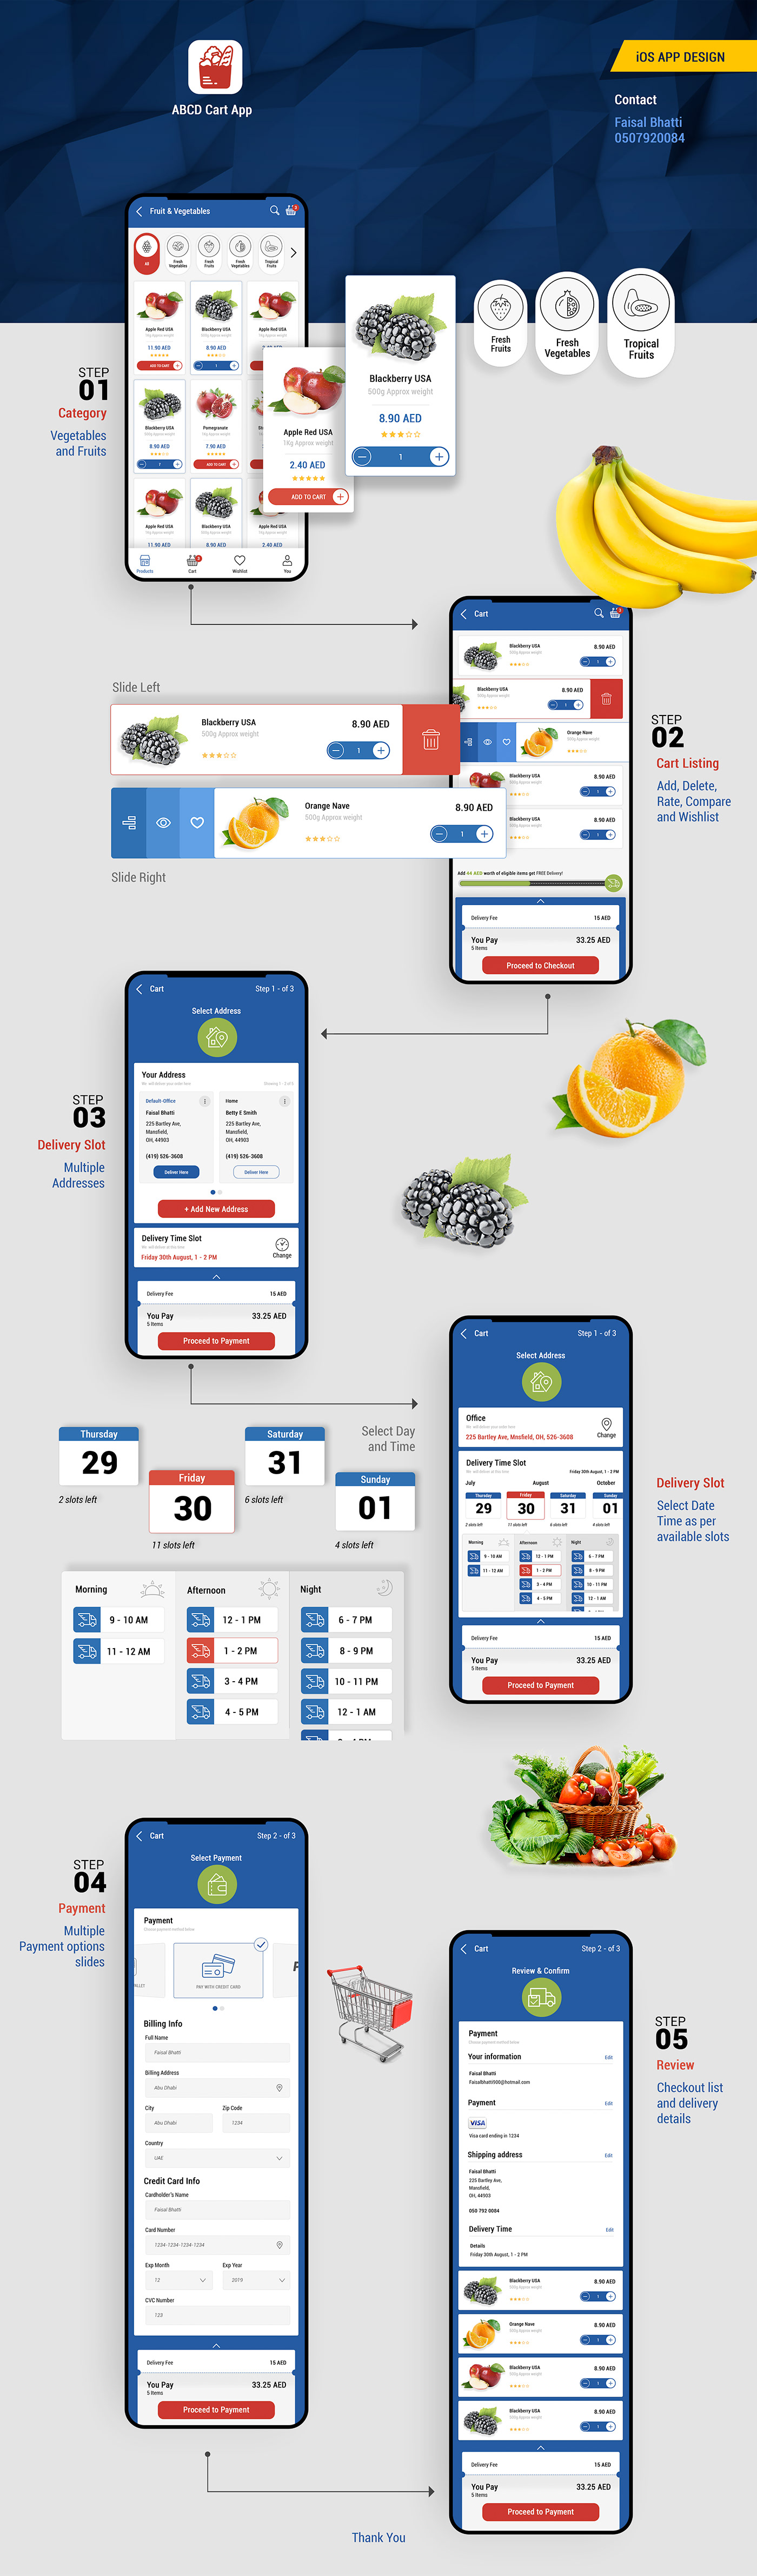 UI designer UX Designer website designer Graphic Designer Freelance Online Shopping Cart